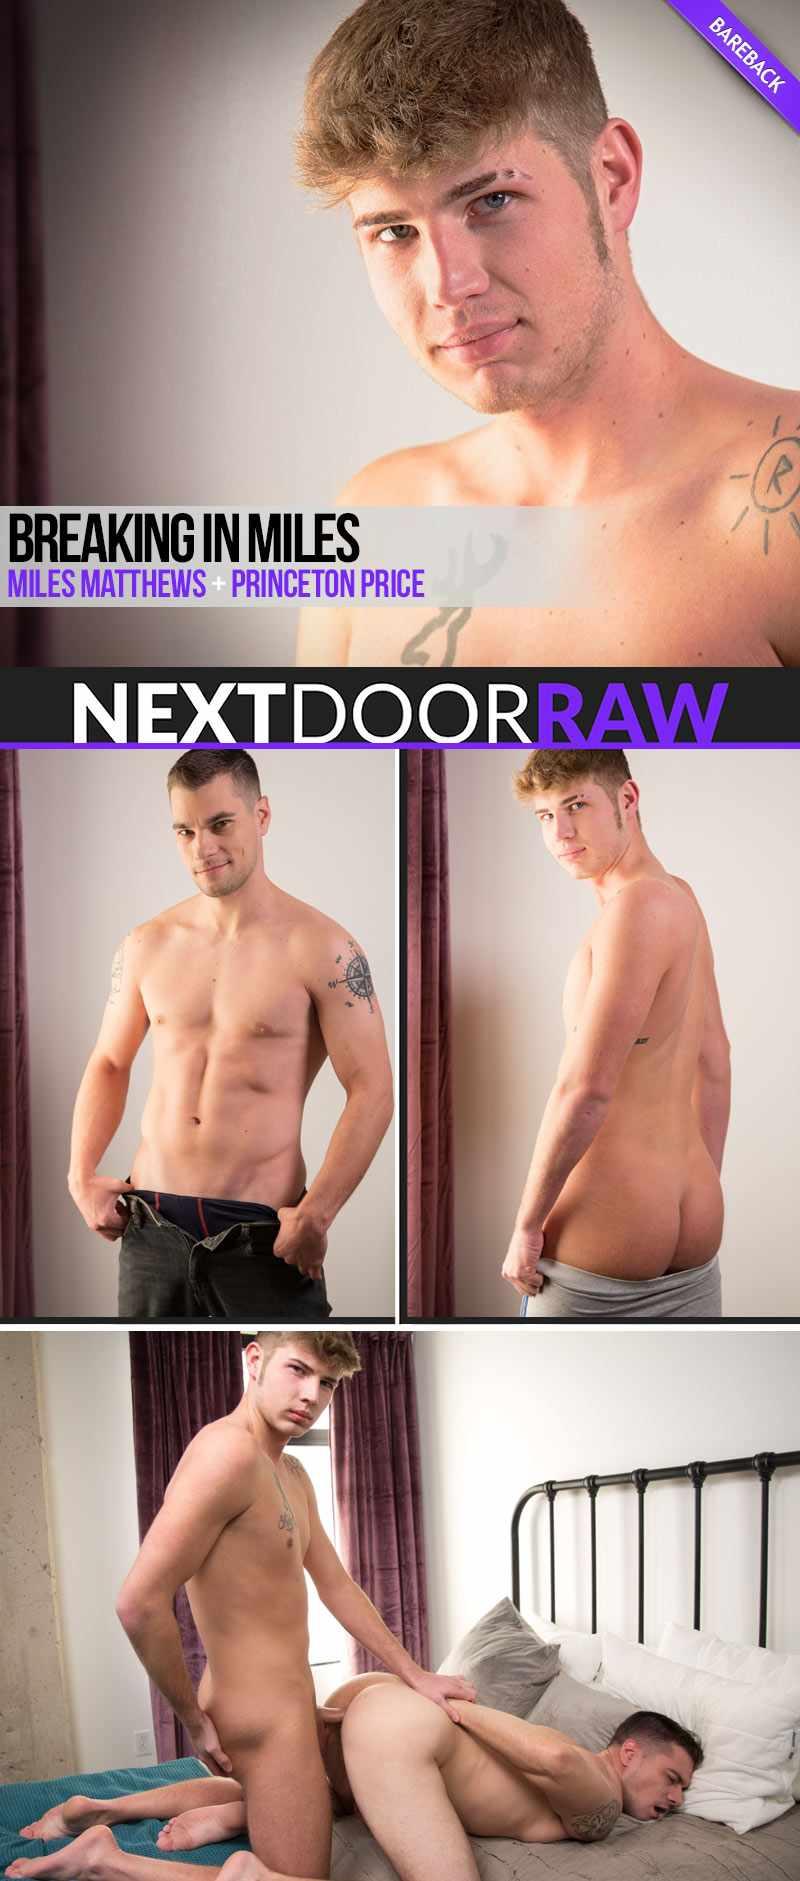 Miles Matthews creams Princeton Price Breaking in Miles - NextDoorRaw